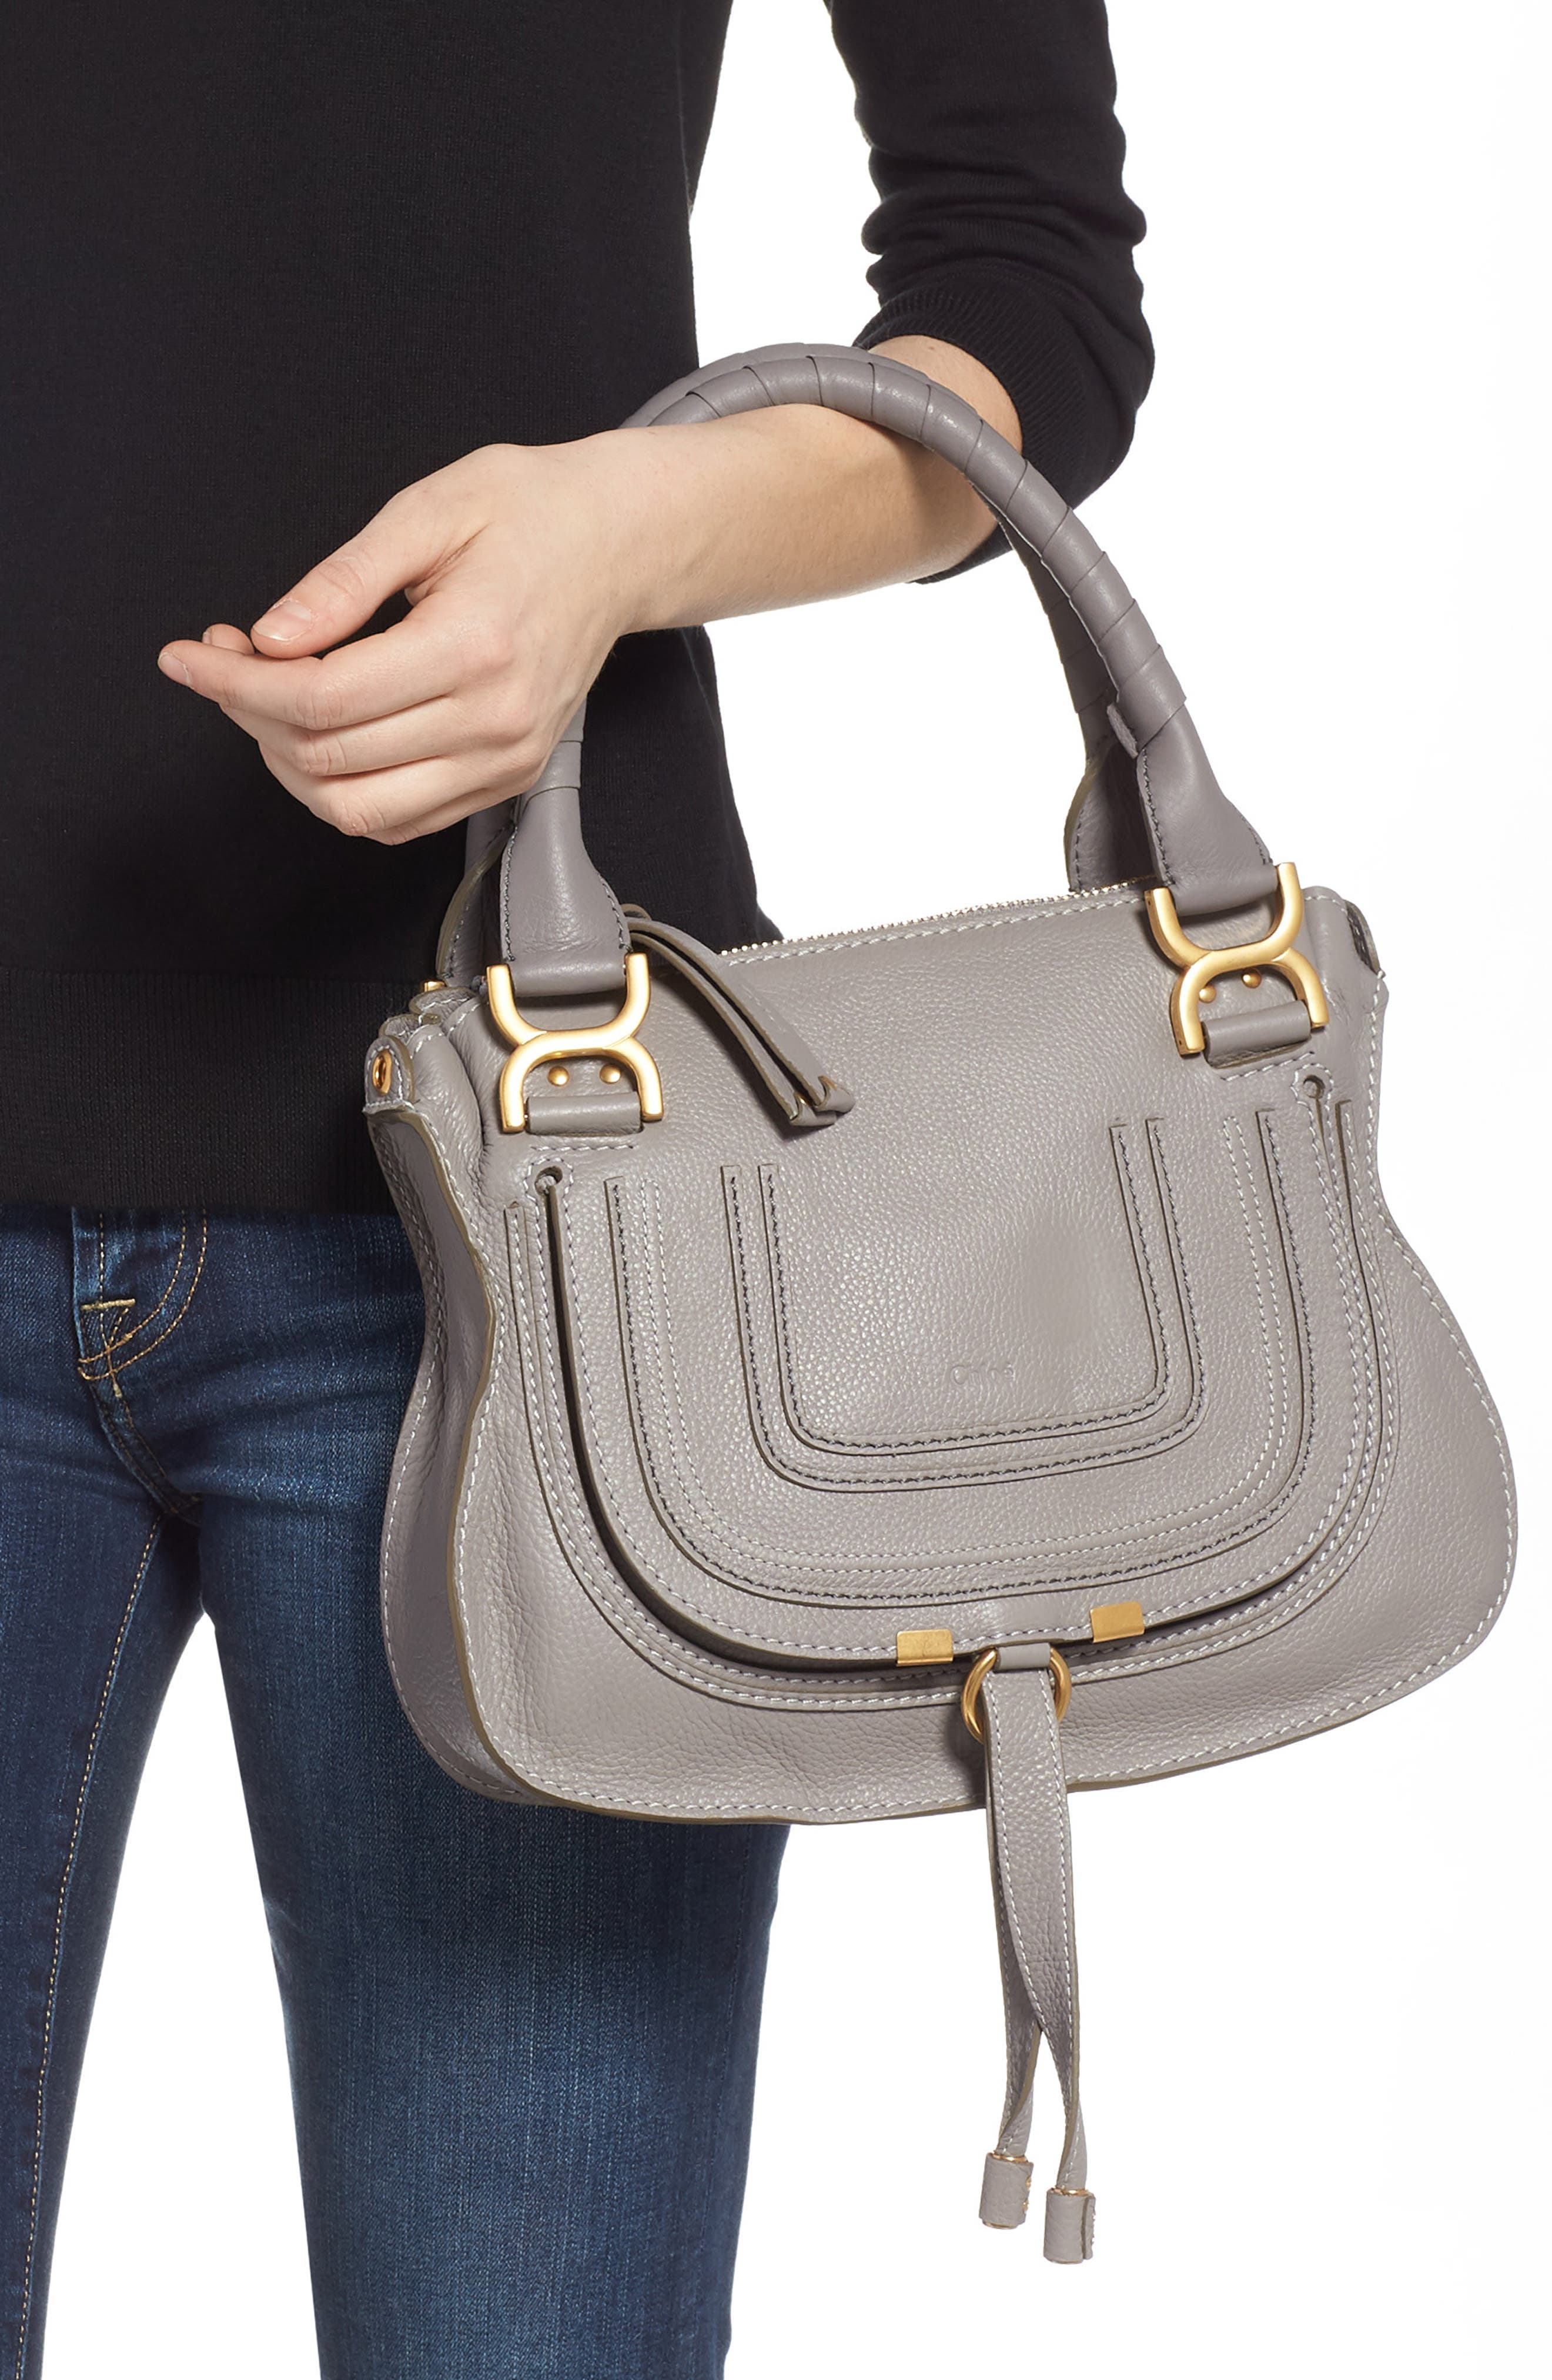 CHLOÉ, Marcie Small Double Carry Bag, Alternate thumbnail 2, color, CASHMERE GREY